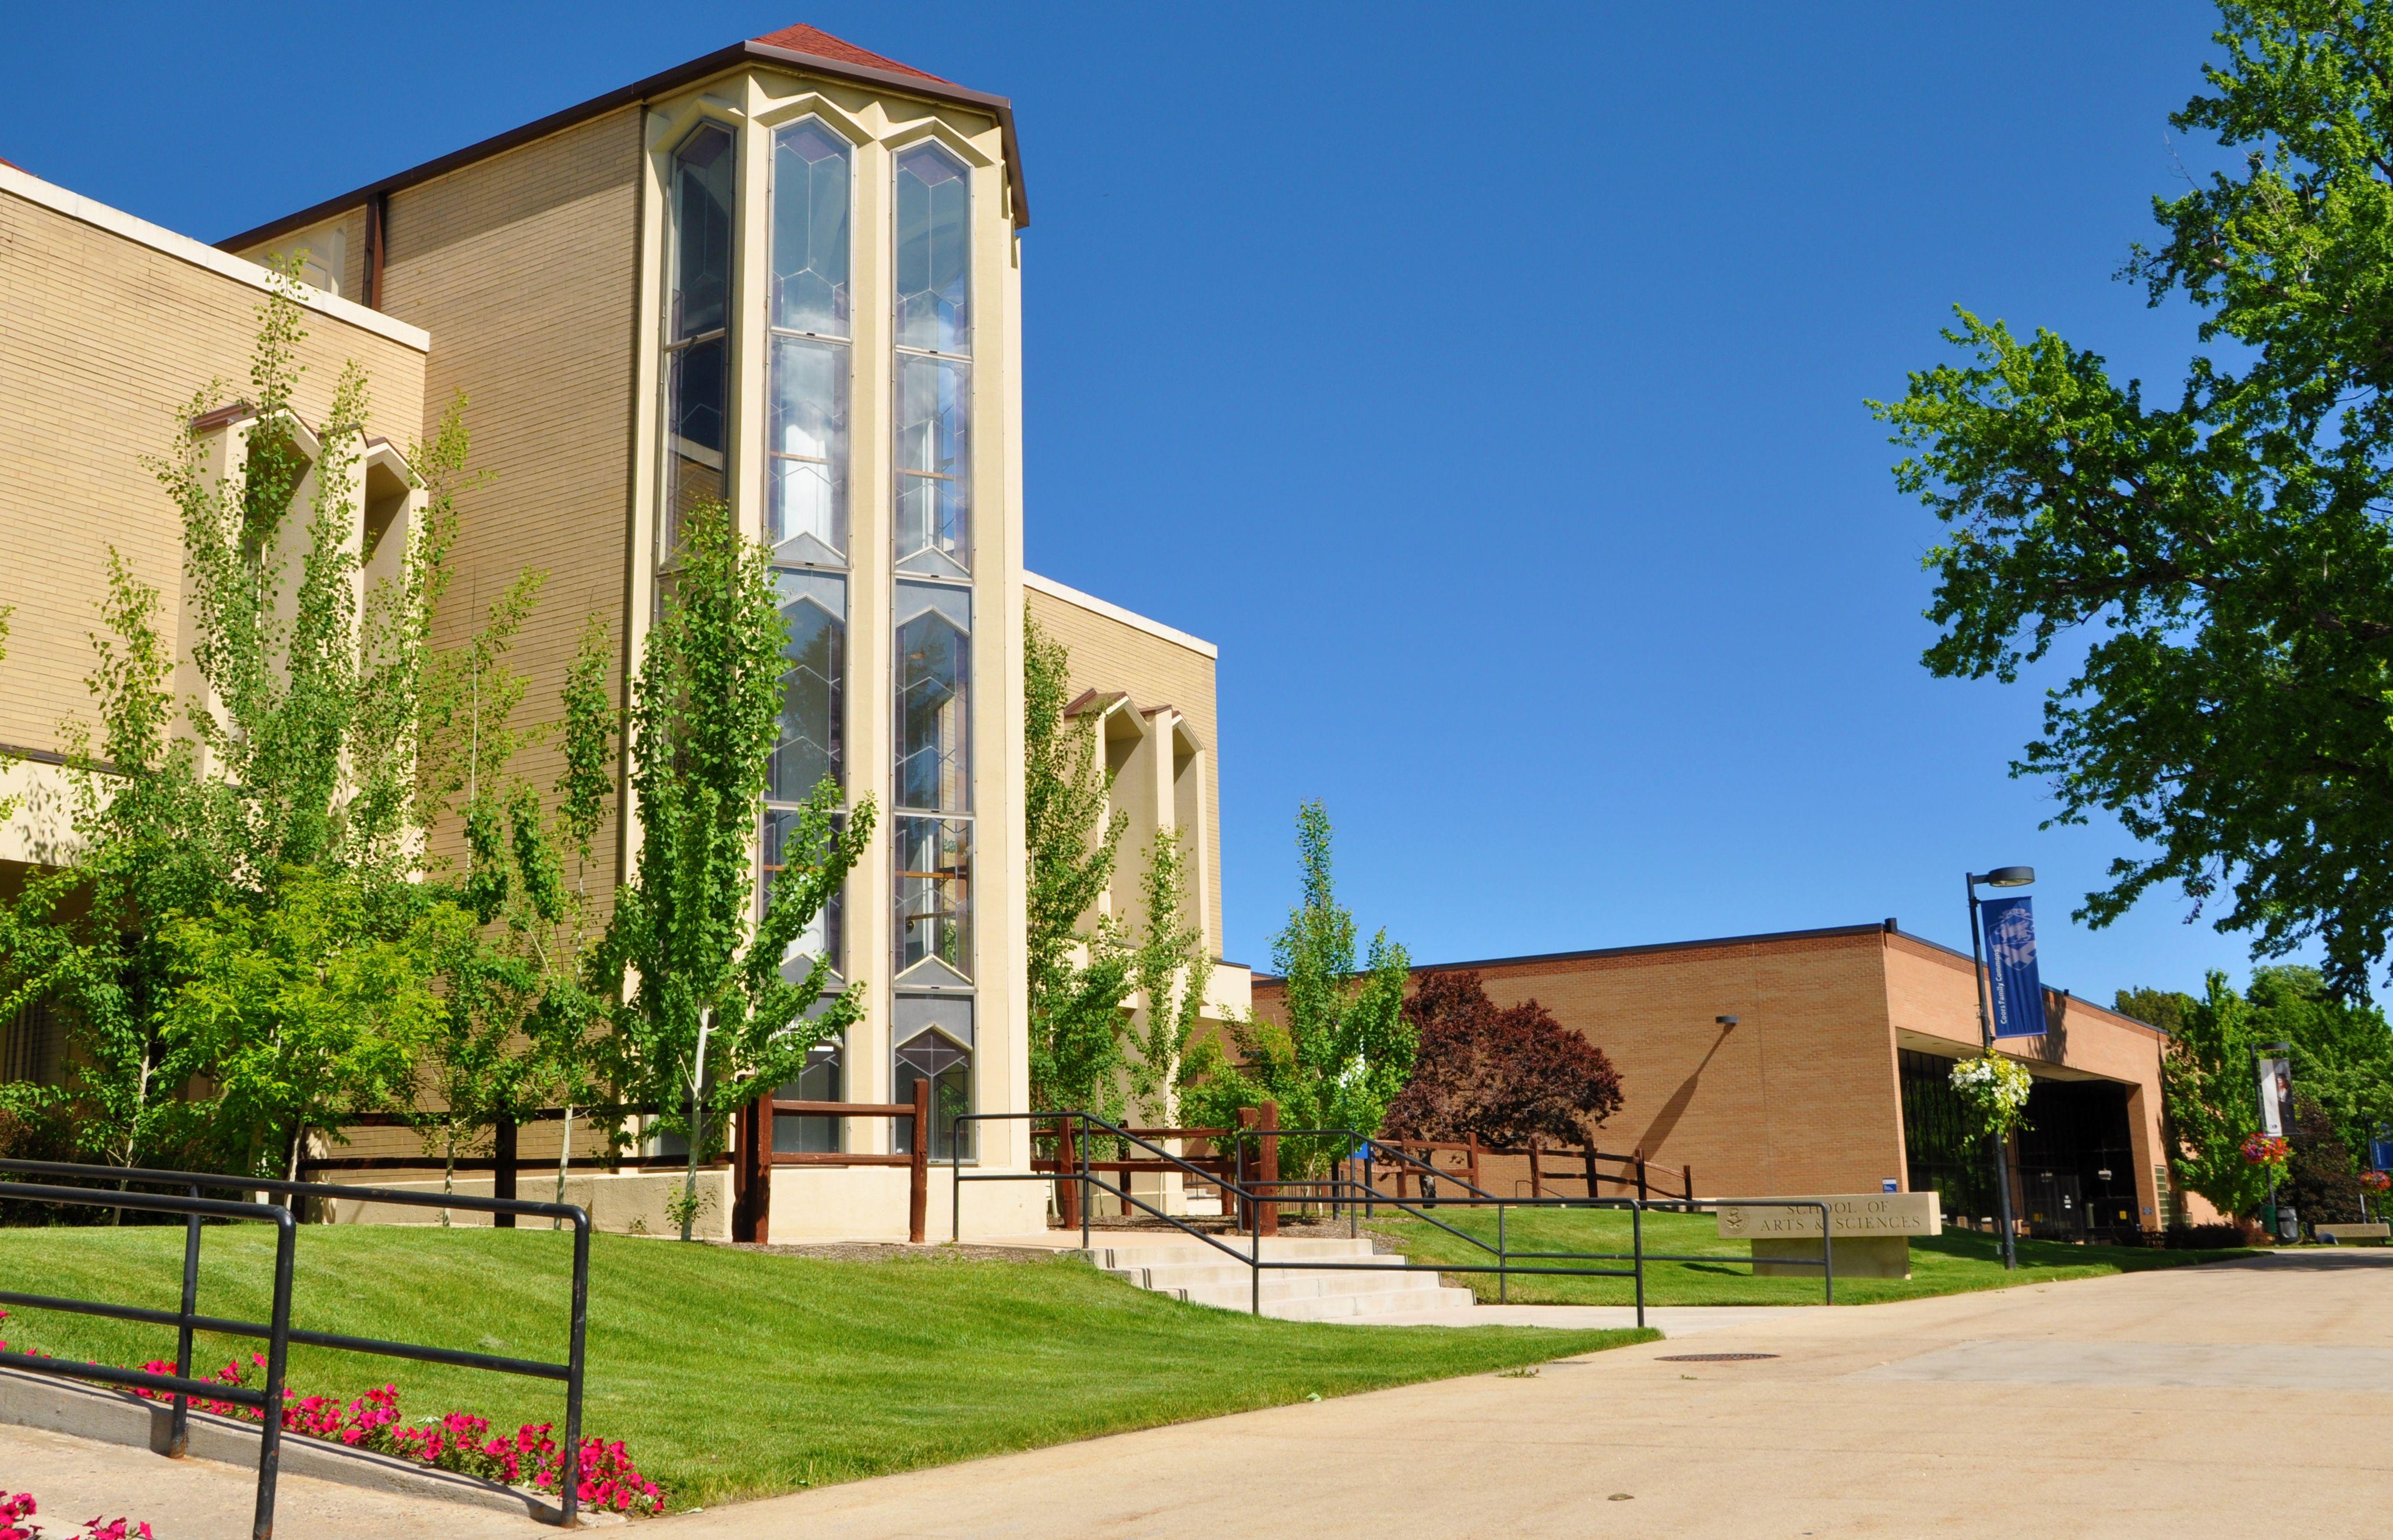 Aspen hall admissions johnson wales university